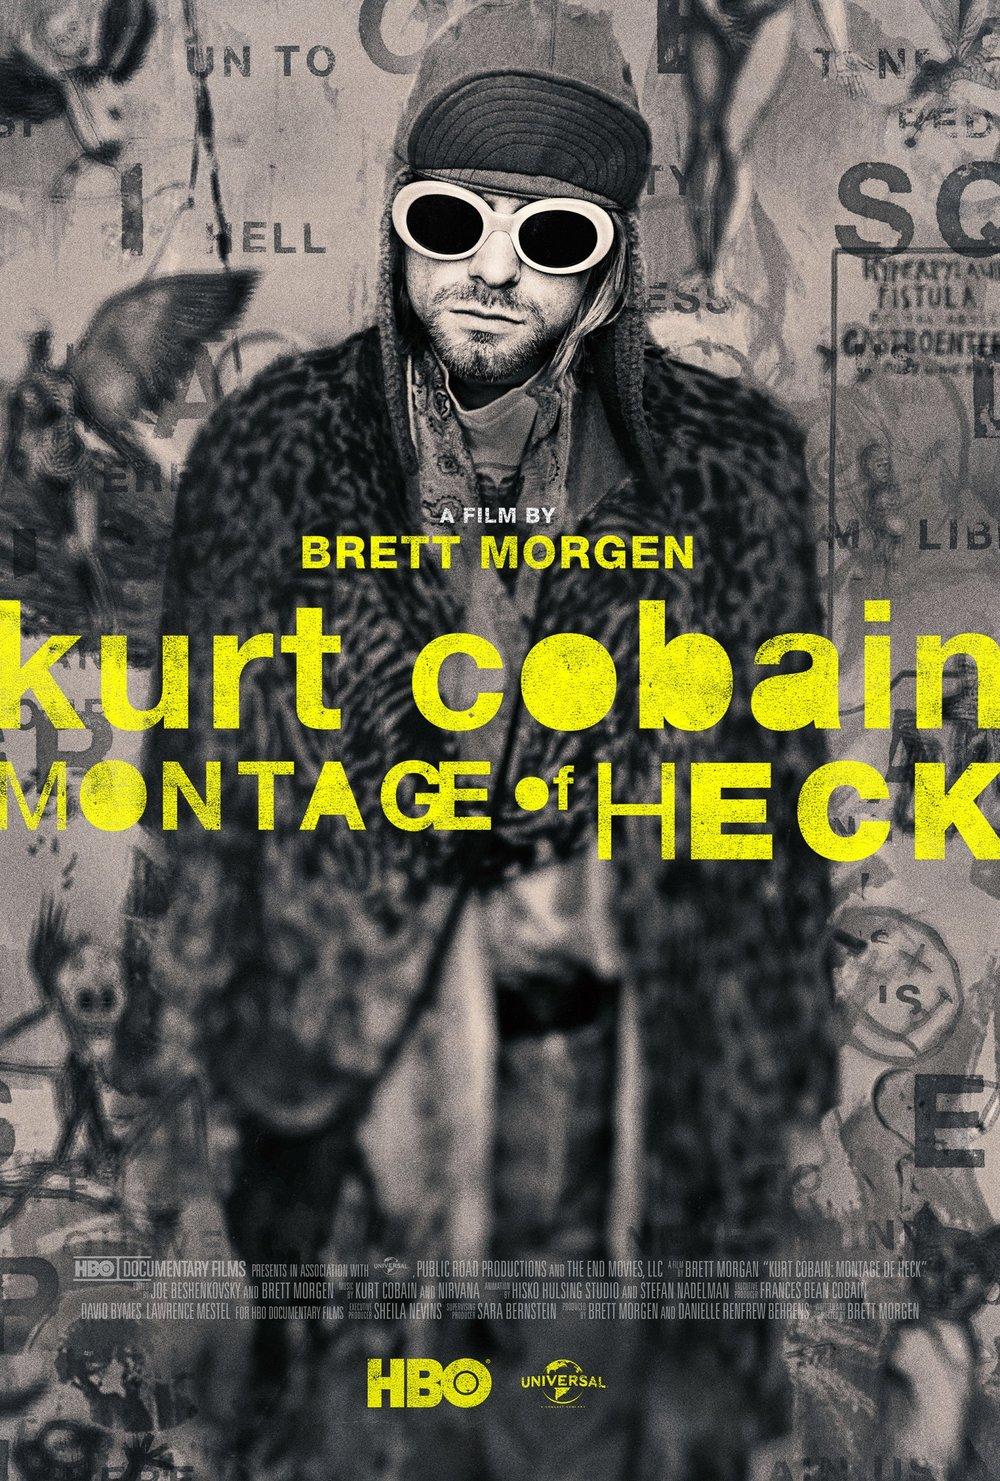 Kurt Cobain - Montage of Heck - poster.jpg